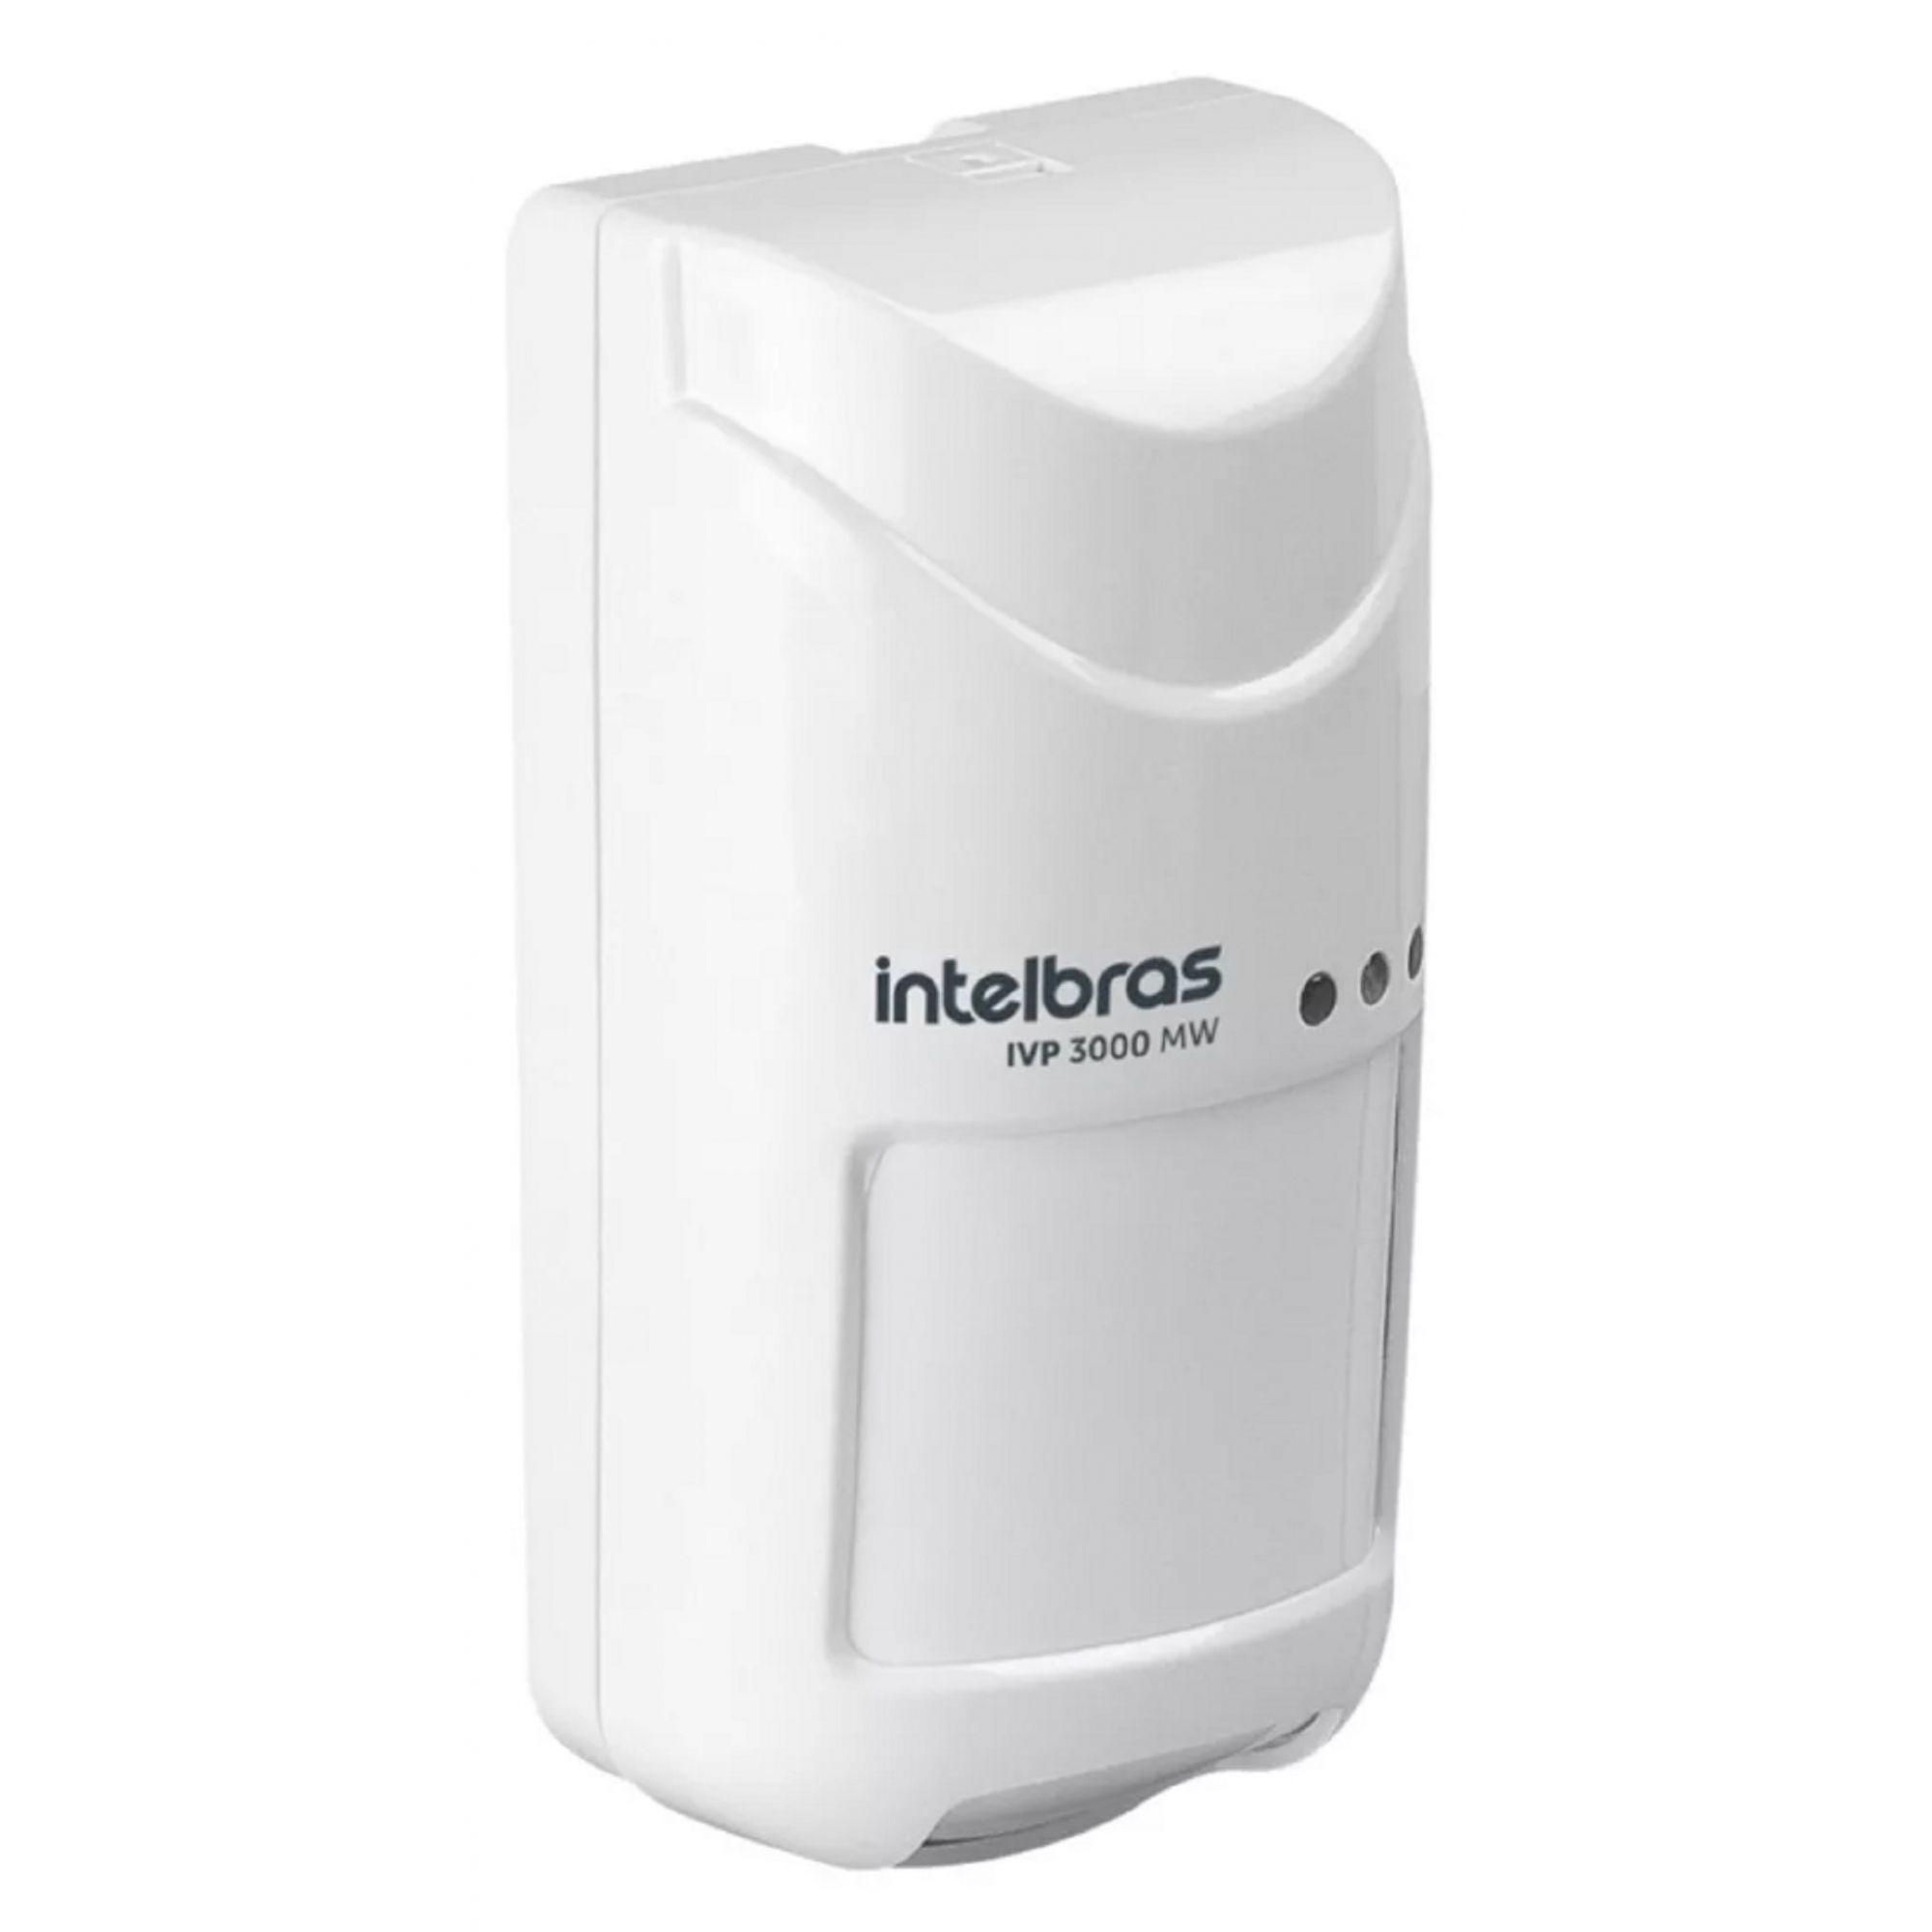 Sensor Passivo Tripla Intelbras Ivp3000 Mw Pet